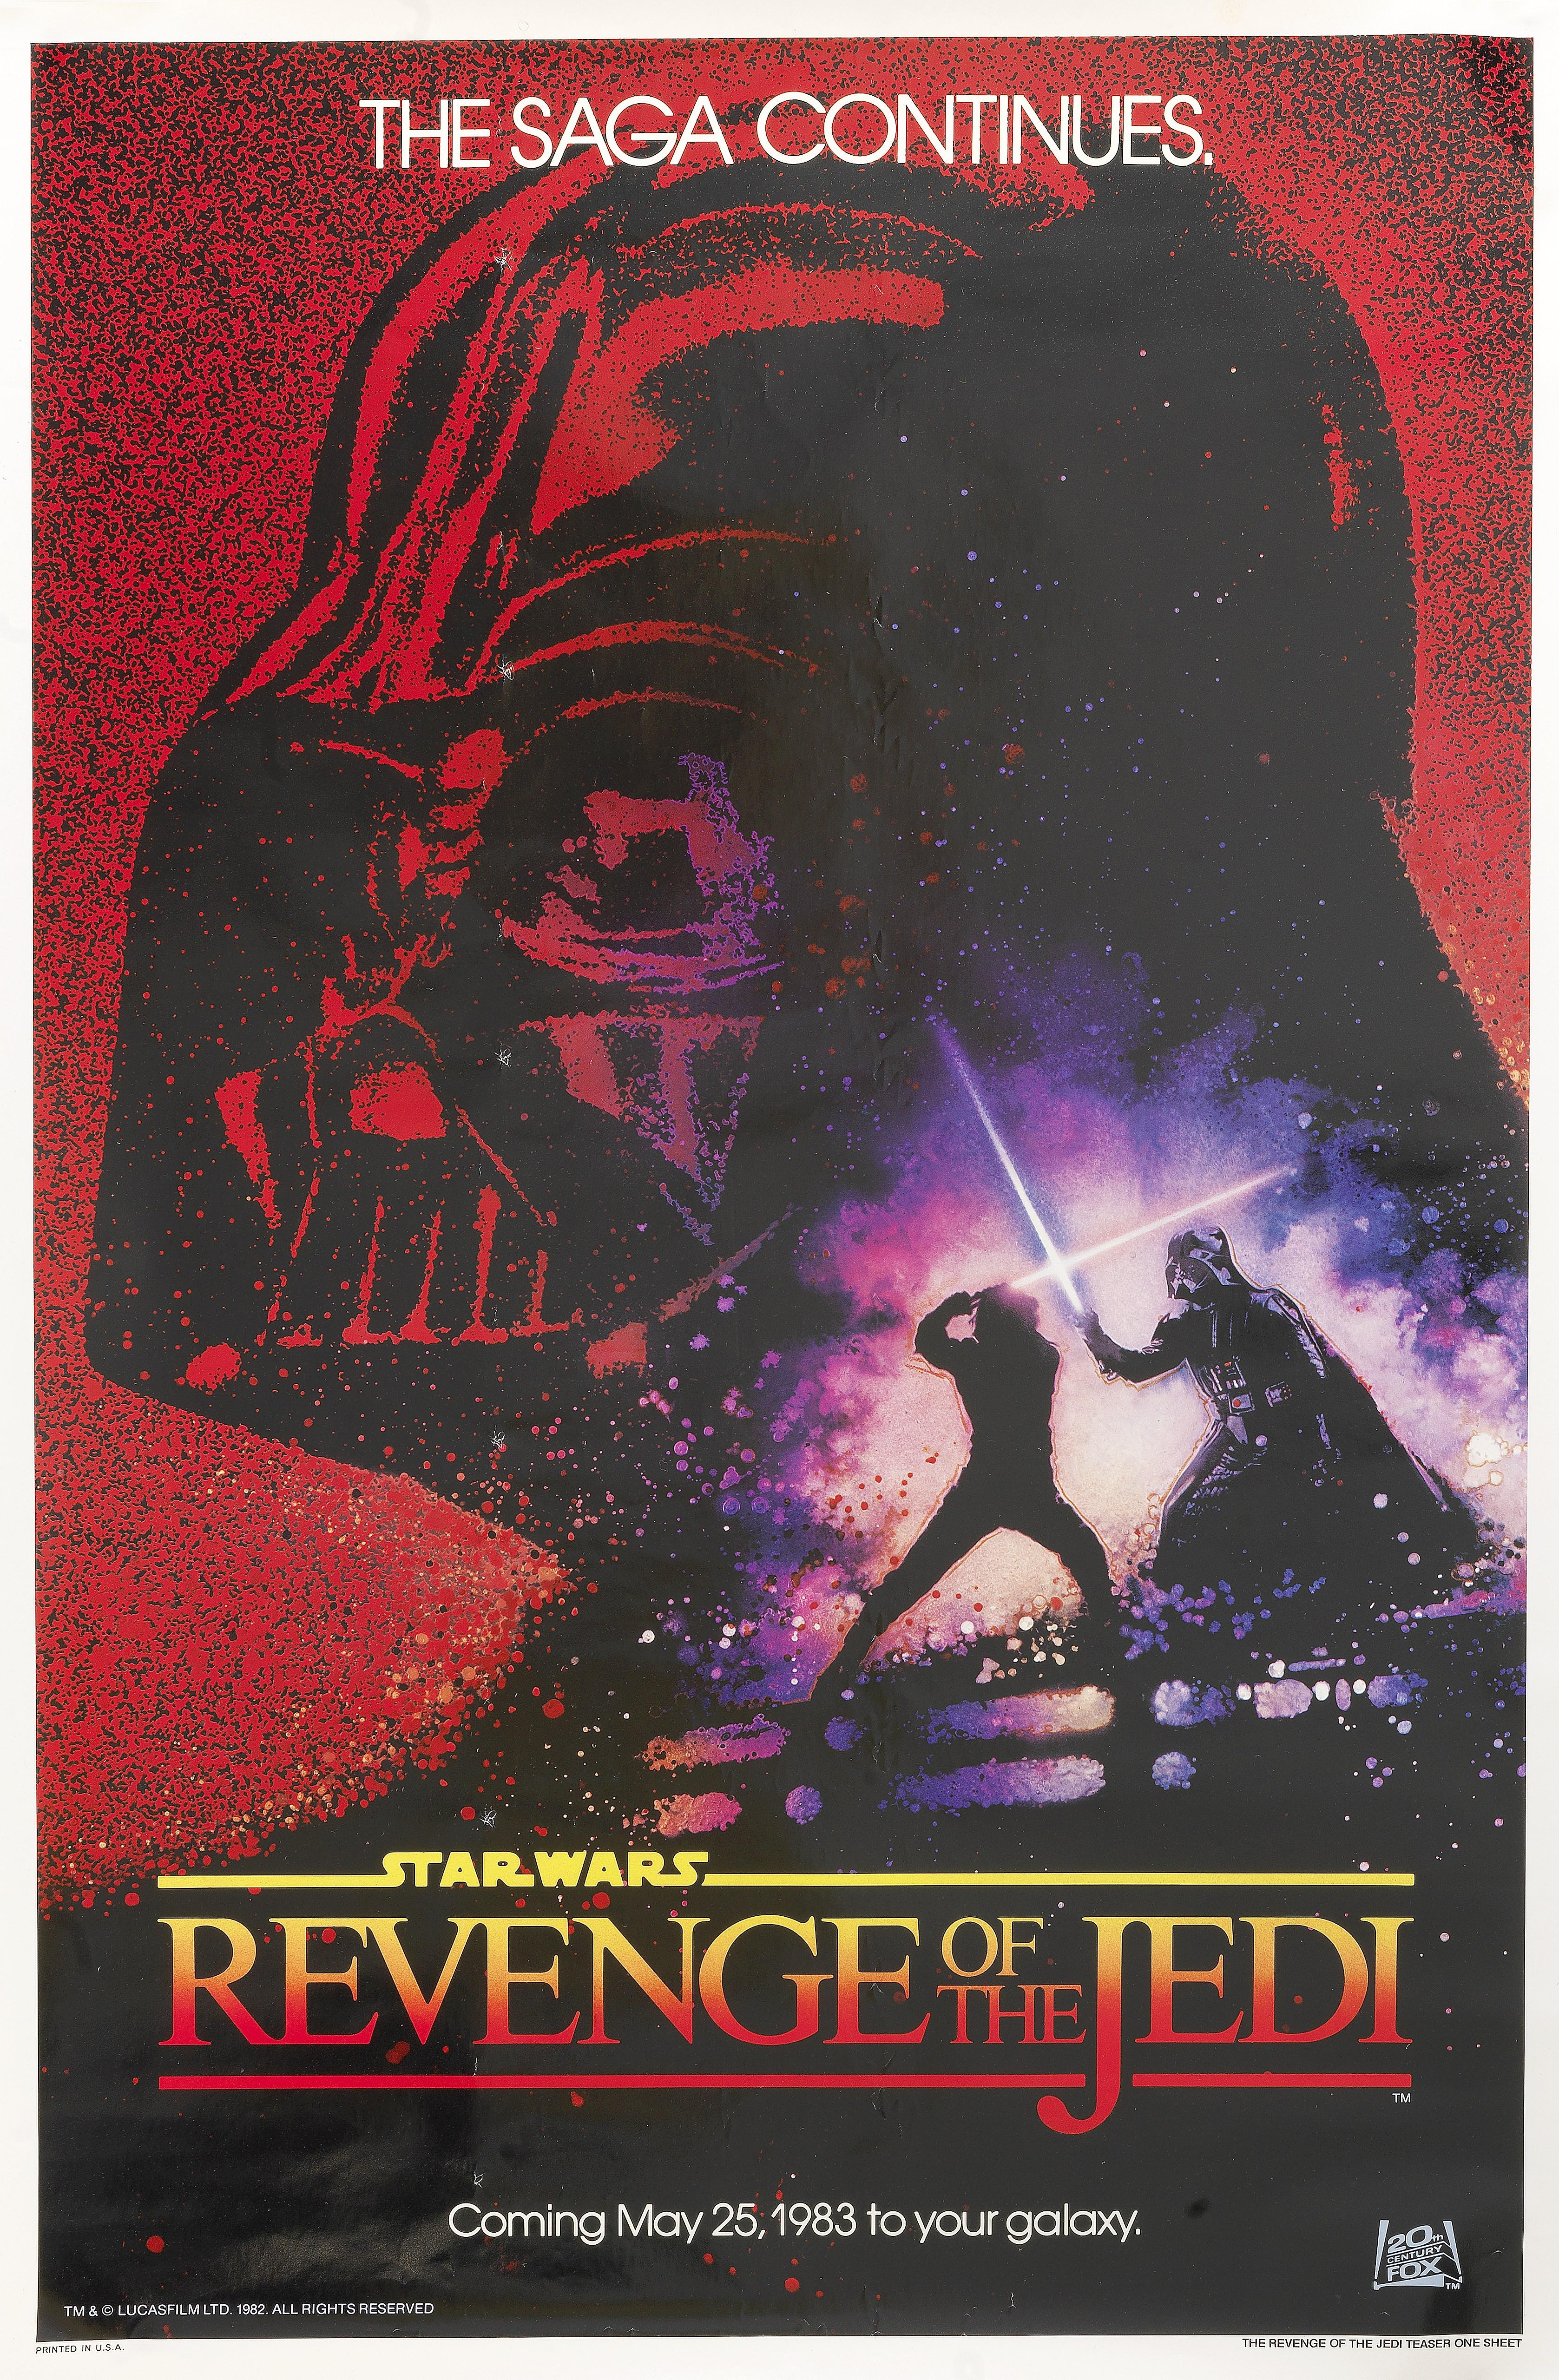 Lot 35 - Revenge of the Jedi, Lucasfilm, 1983,